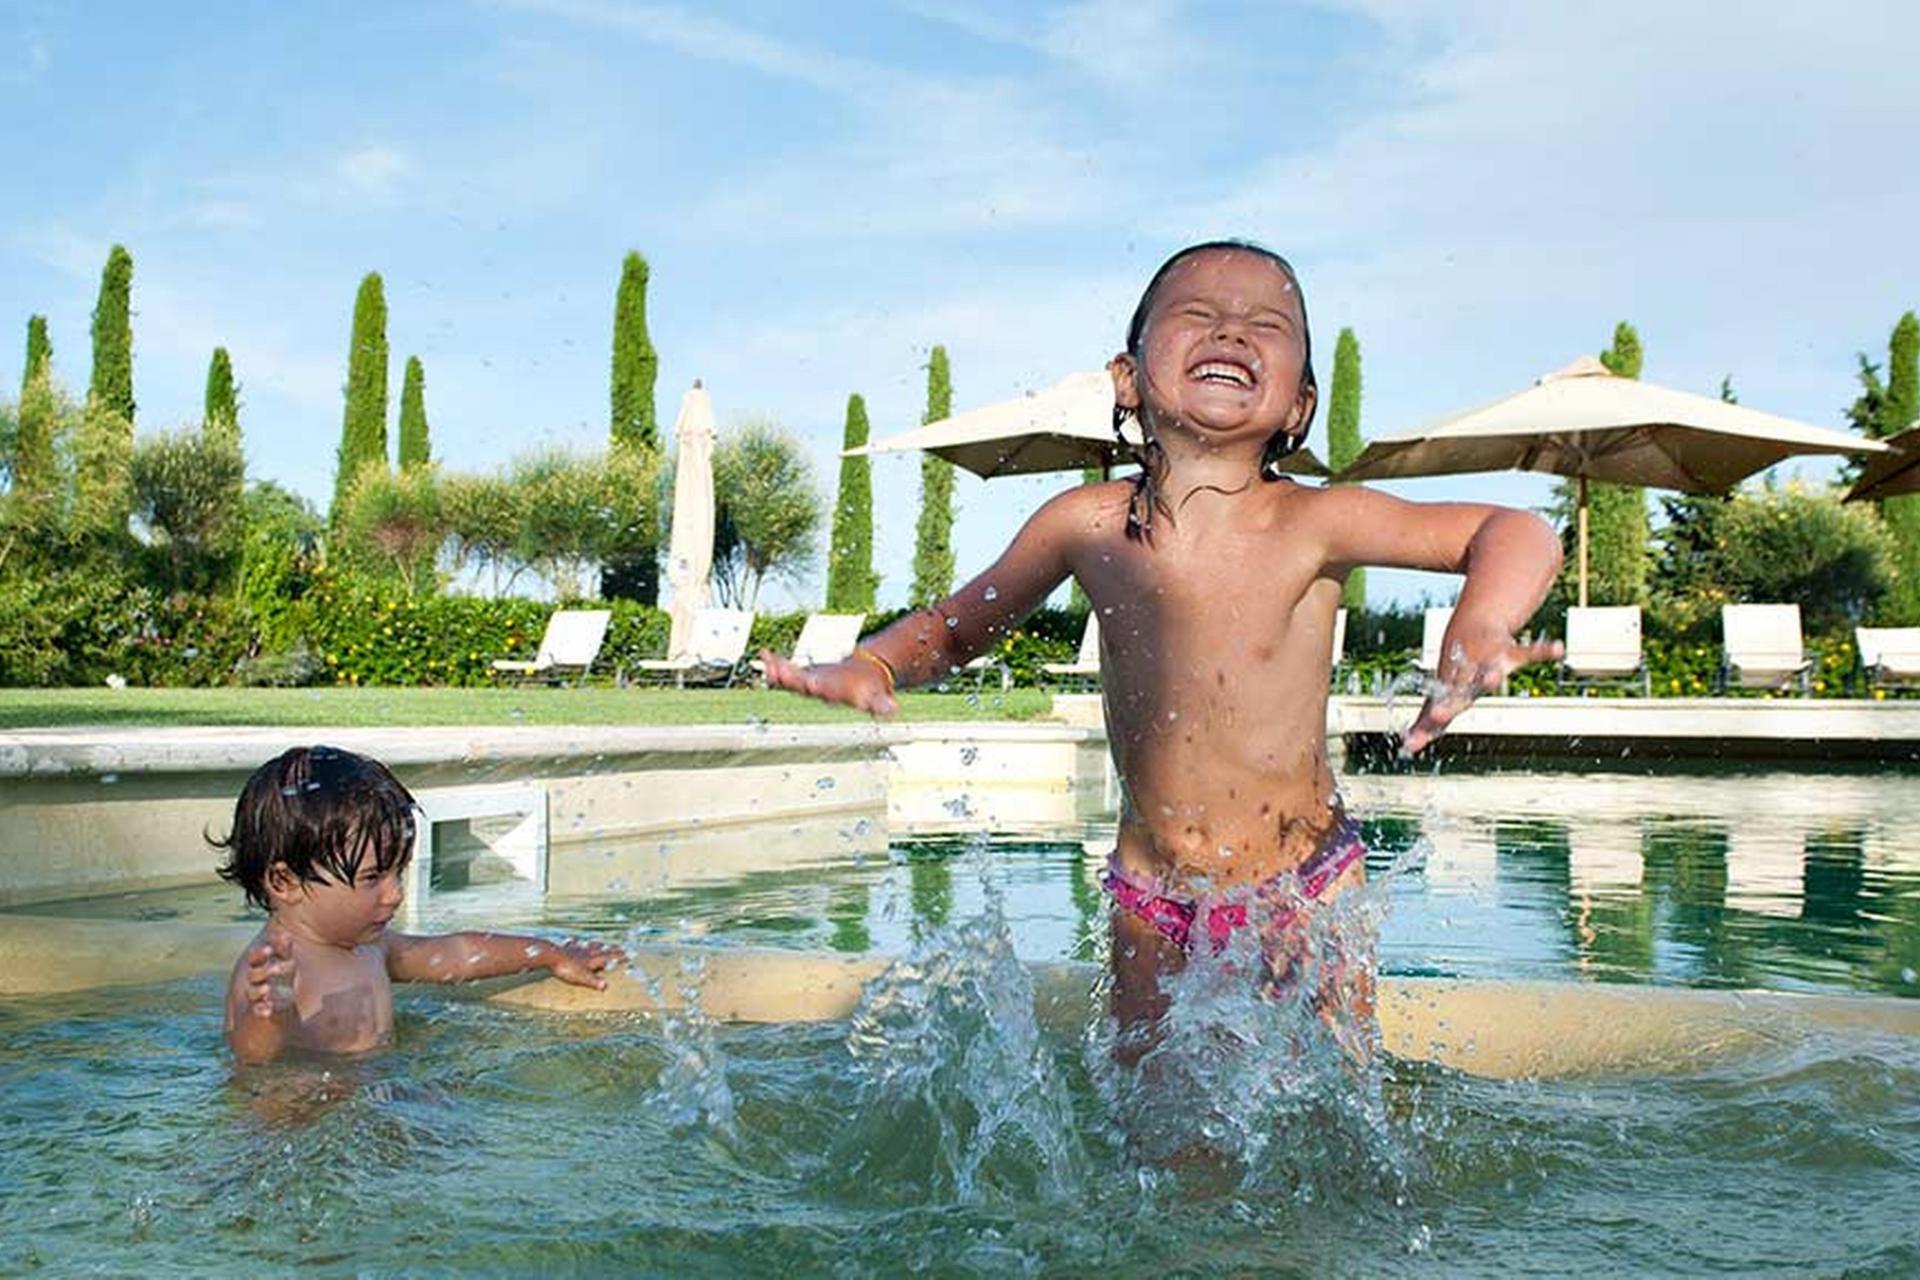 Agriturismo Puglia Authentic Agriturismo - Farmhouse with fantastic pool in Puglia